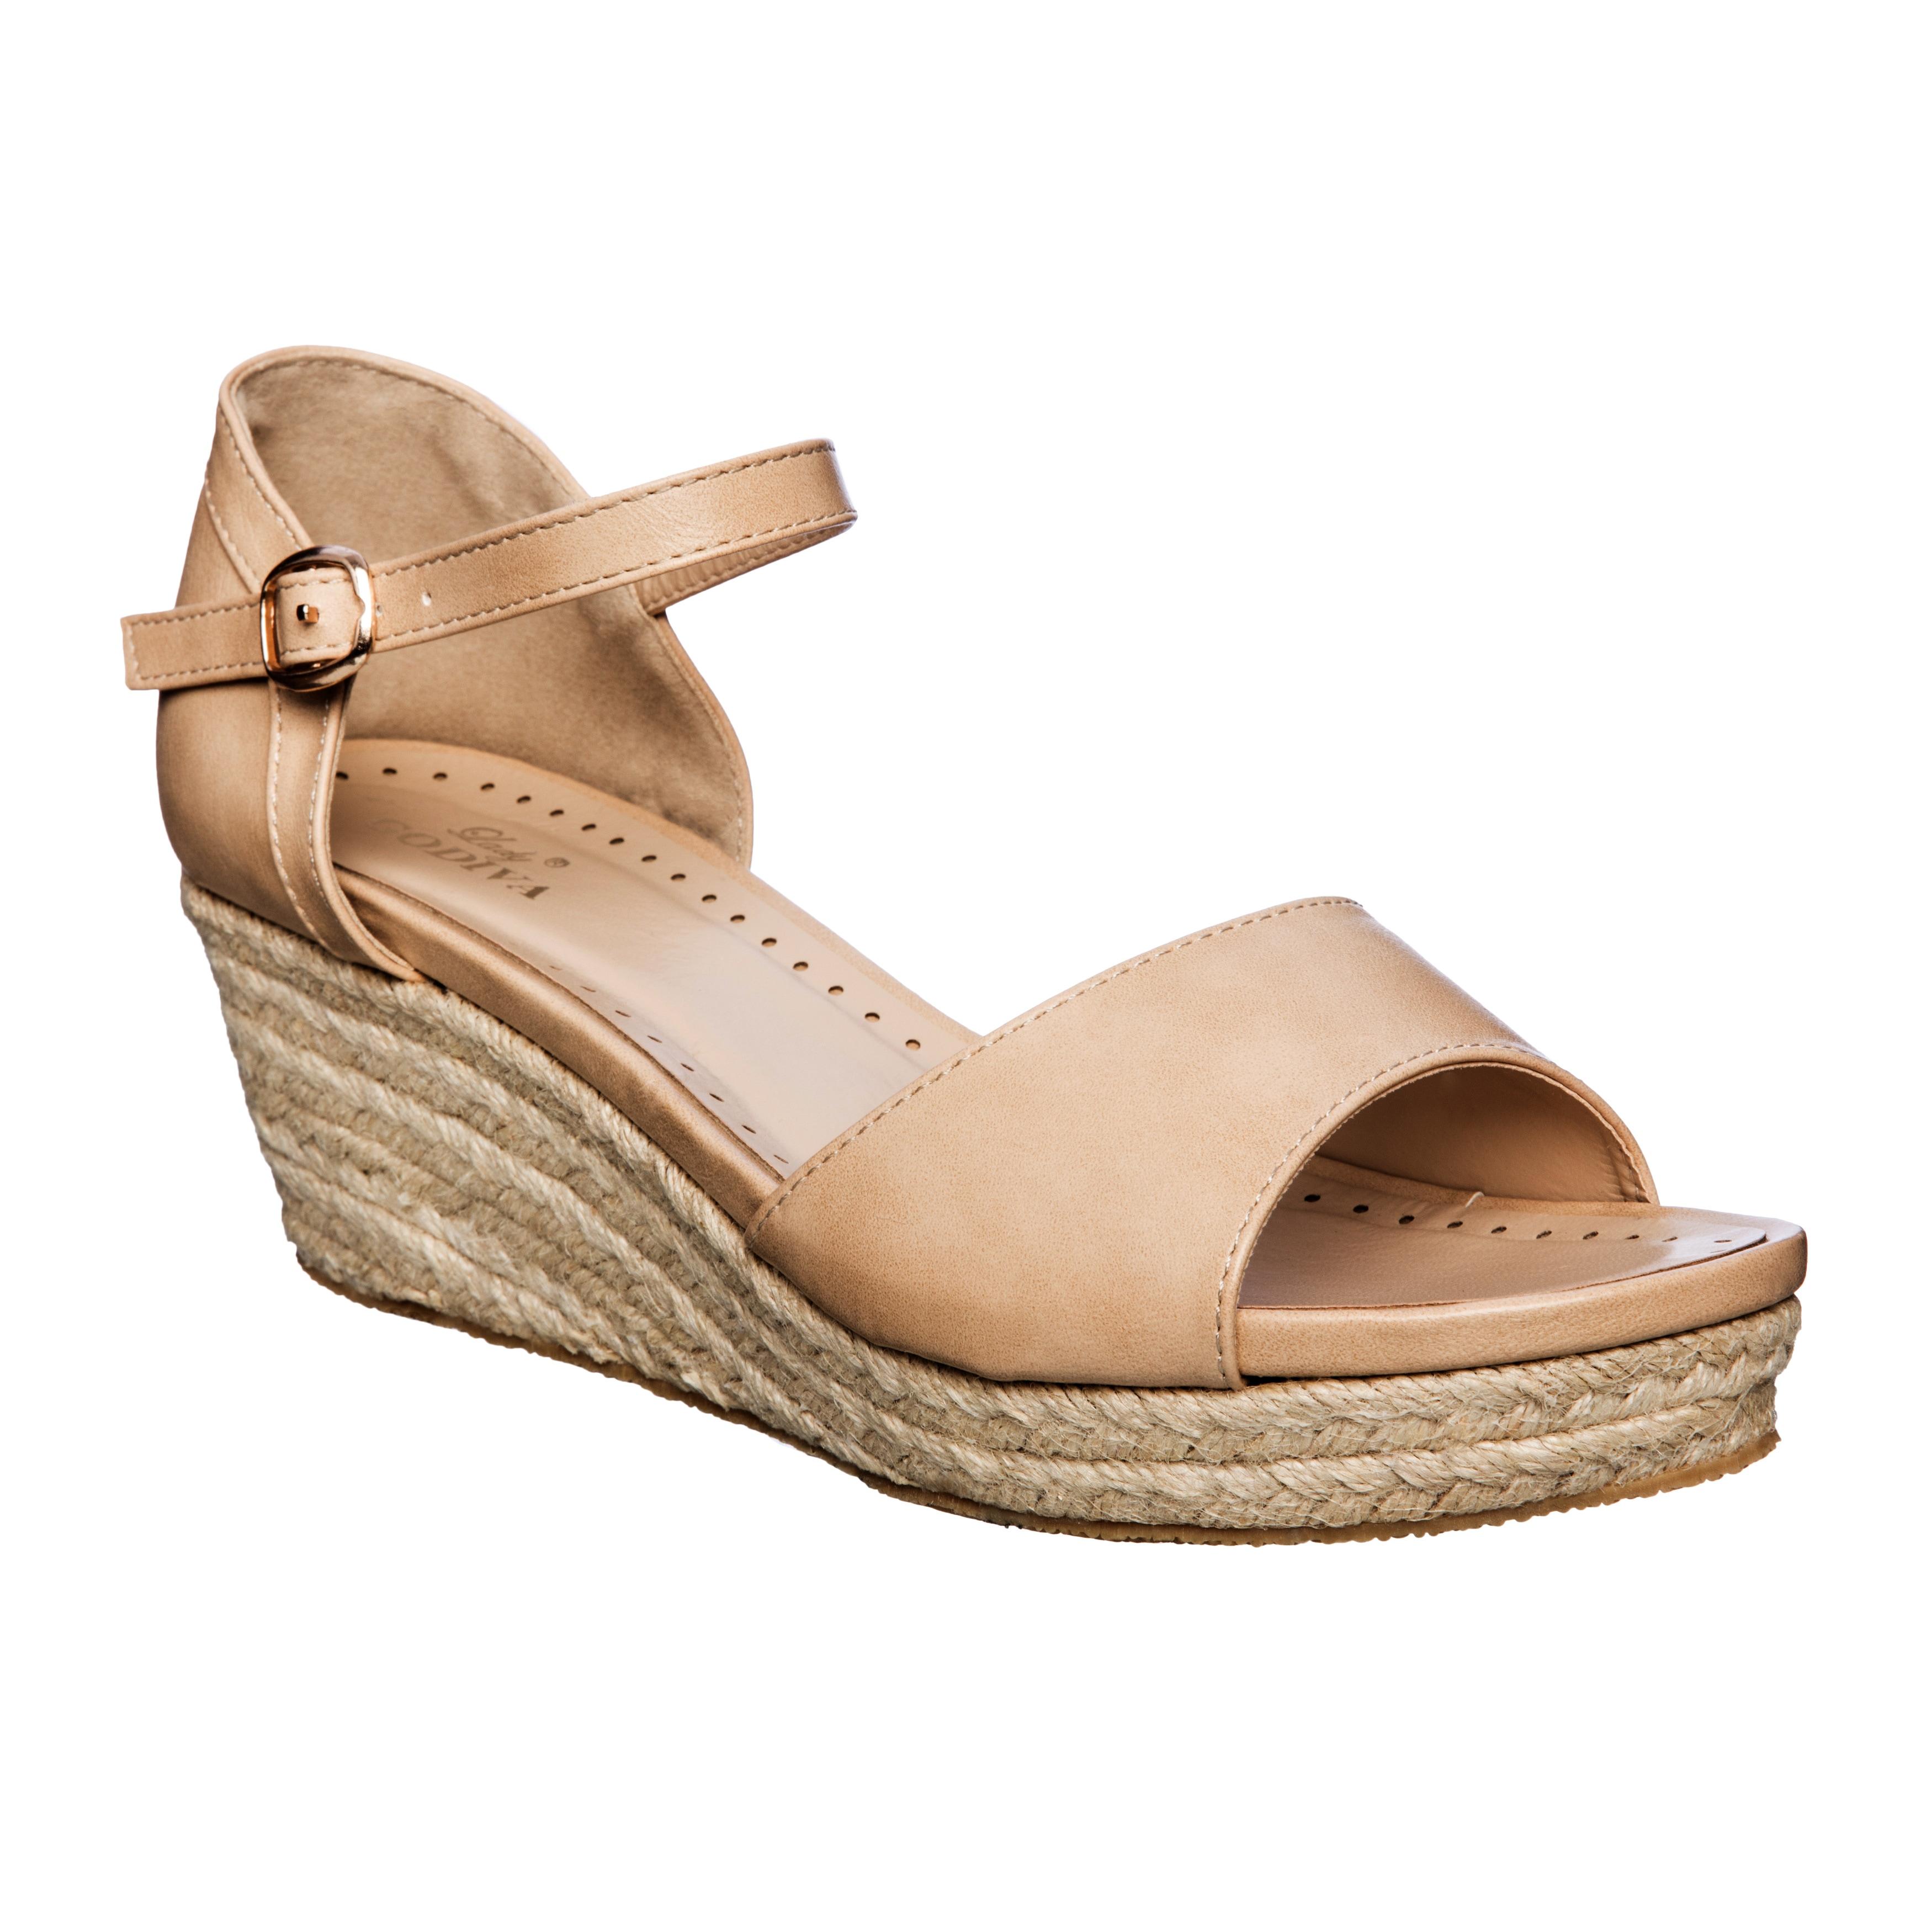 wedge cork sandals comforter classified flatform toe women city comfort s itm ankle open strap womens